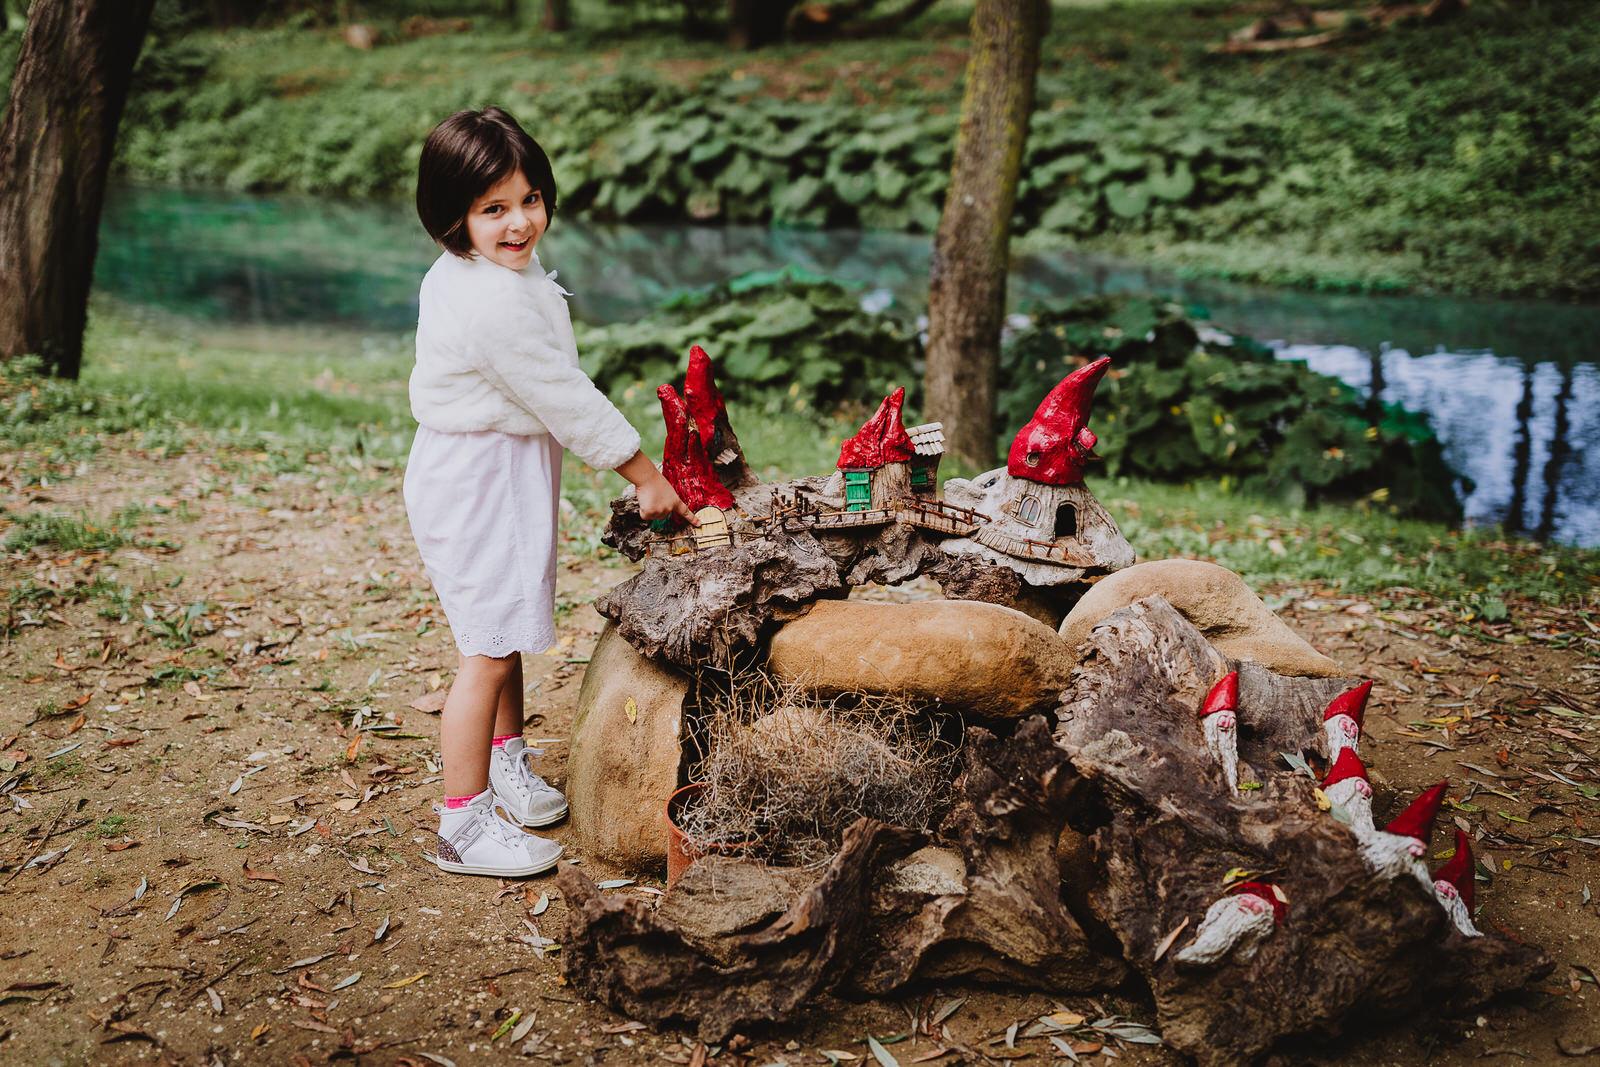 Fotografo per bambini a Macerata